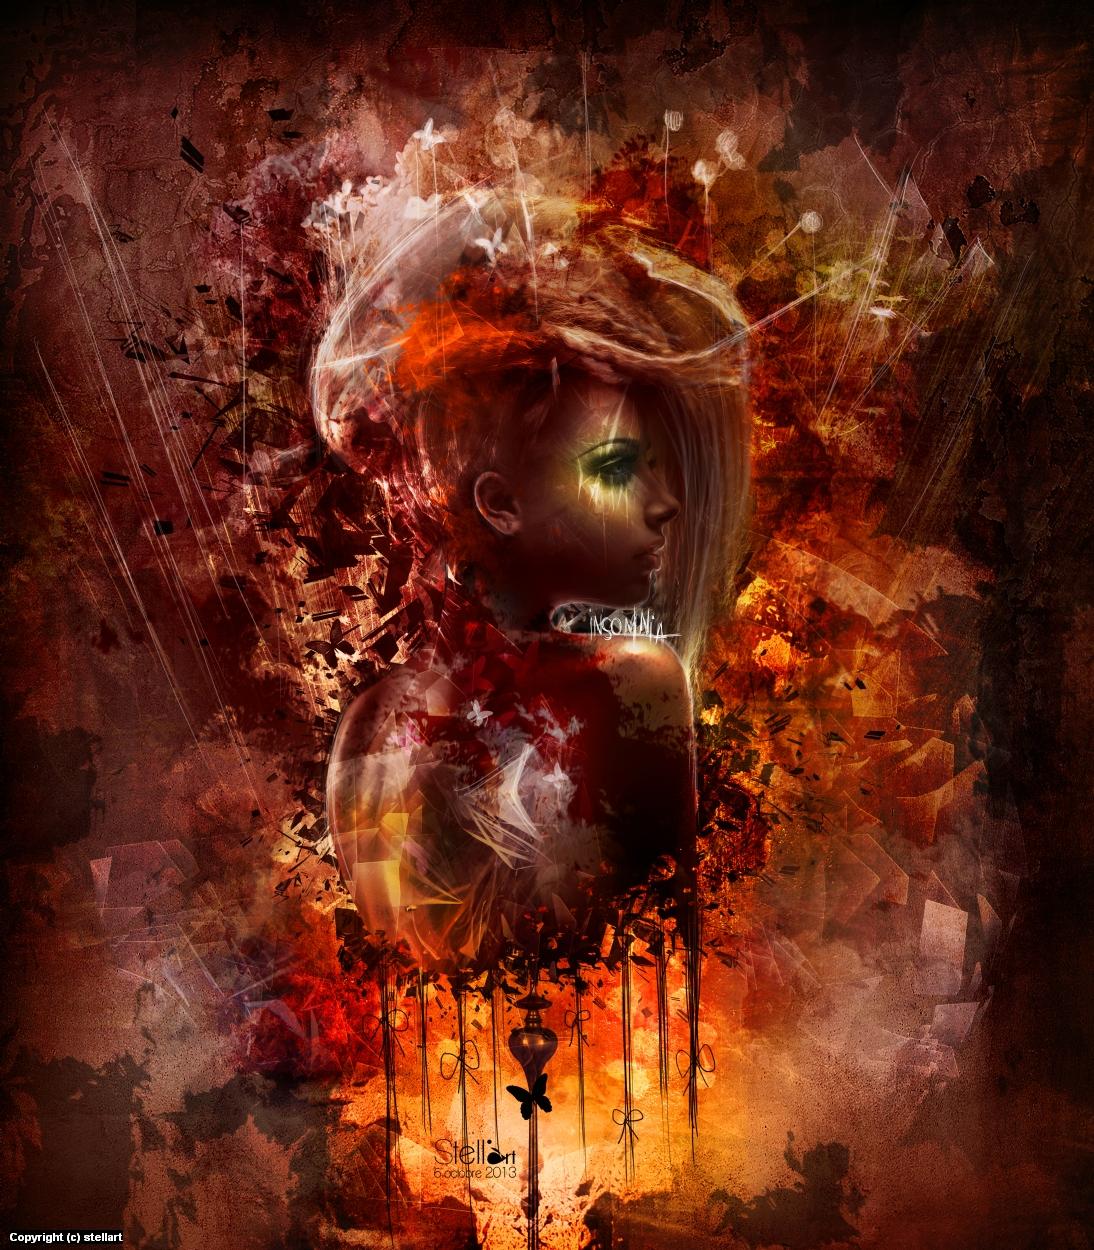 Insomnia Artwork by Estelle Chomienne